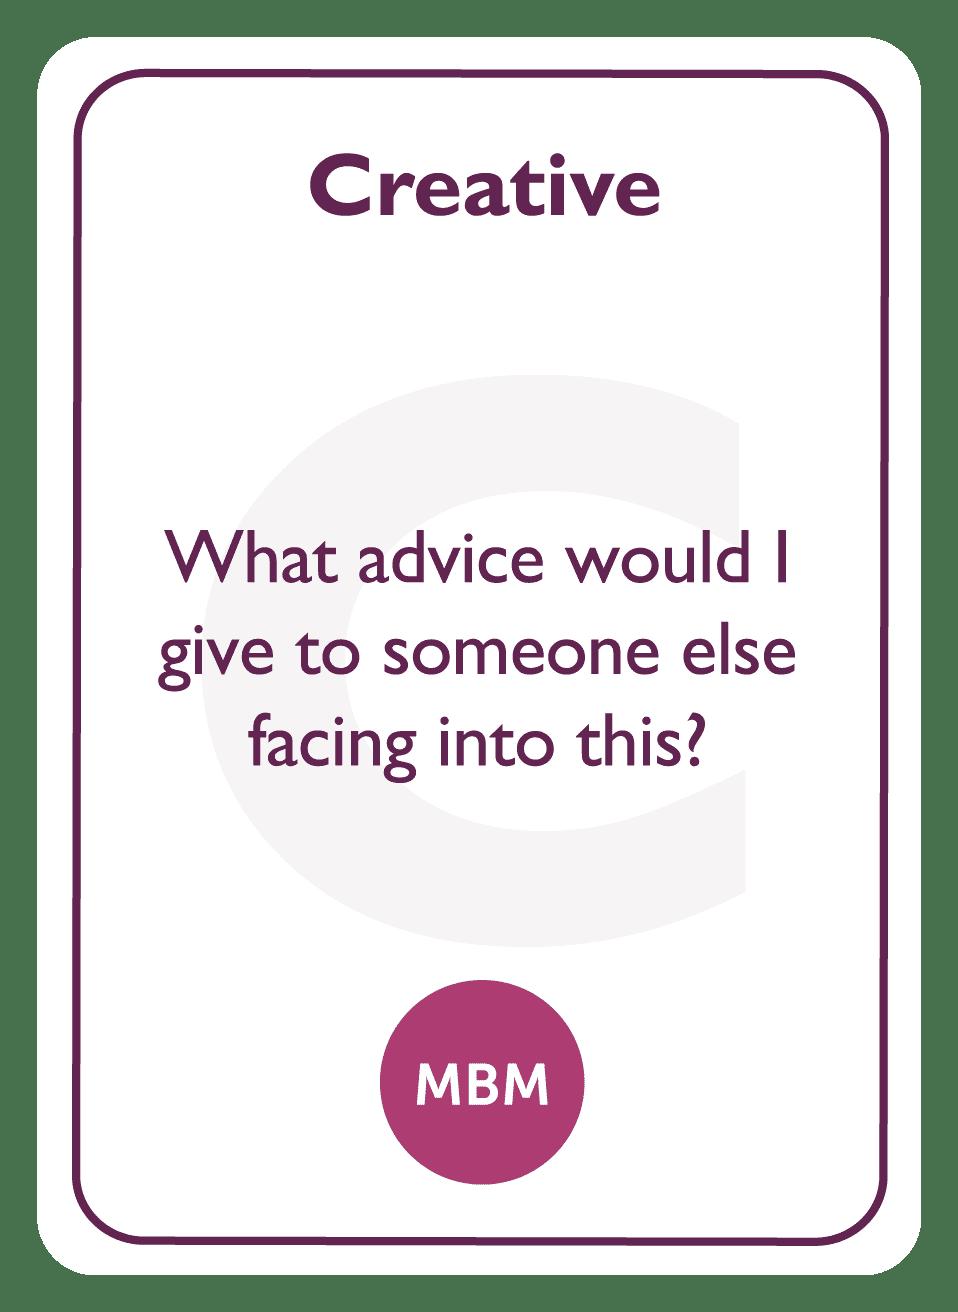 Coaching card titled Creative